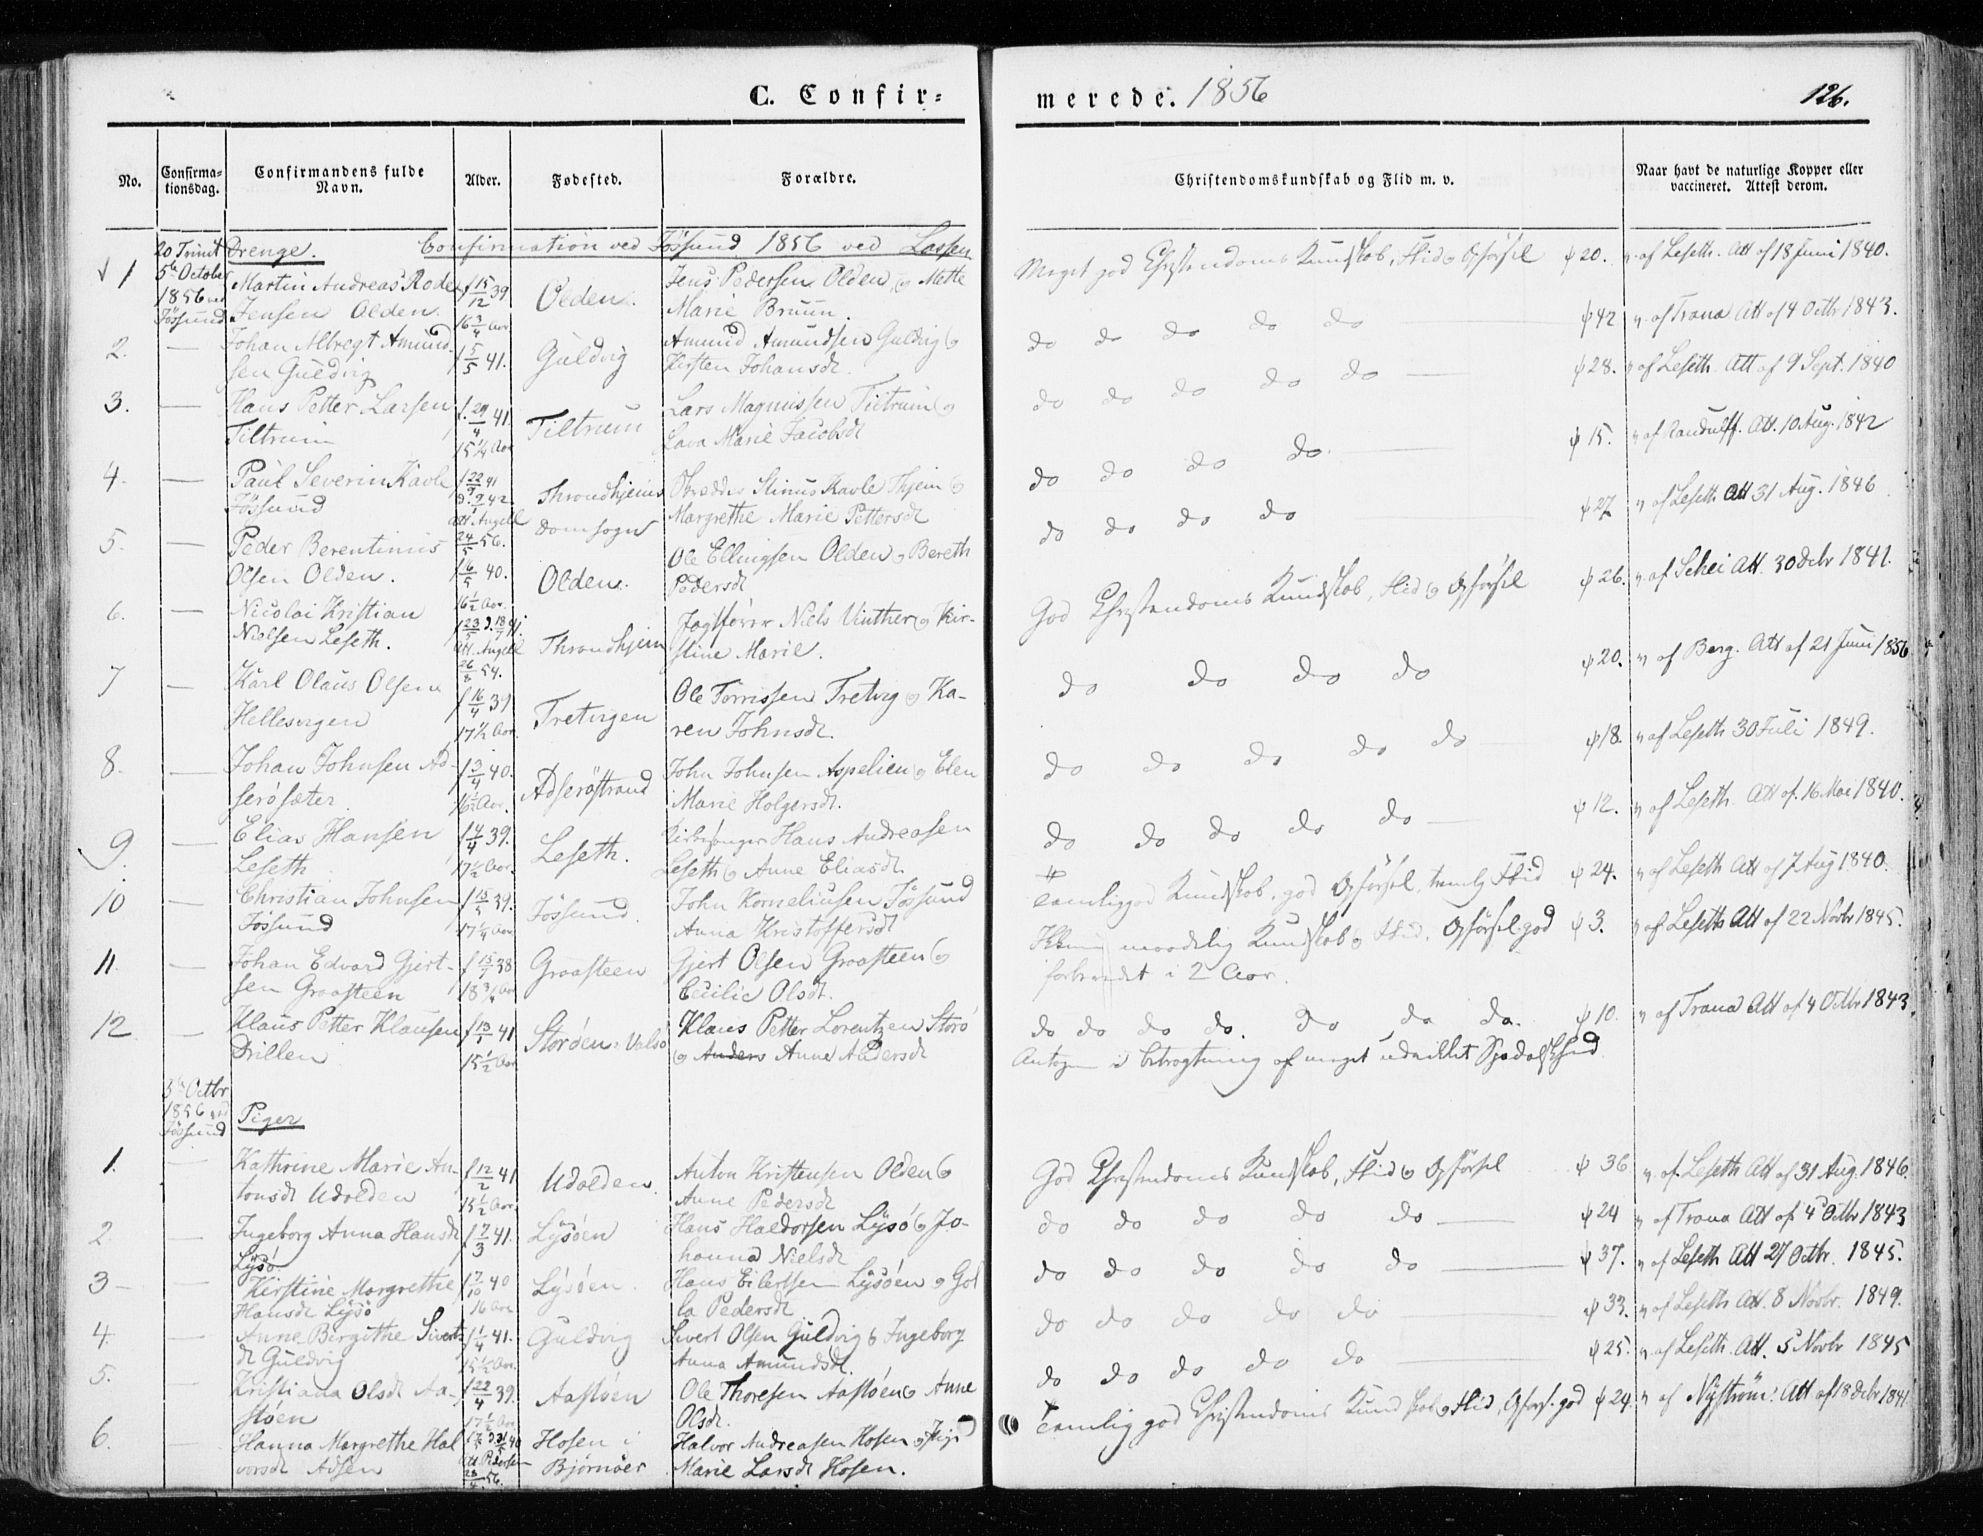 SAT, Ministerialprotokoller, klokkerbøker og fødselsregistre - Sør-Trøndelag, 655/L0677: Parish register (official) no. 655A06, 1847-1860, p. 126